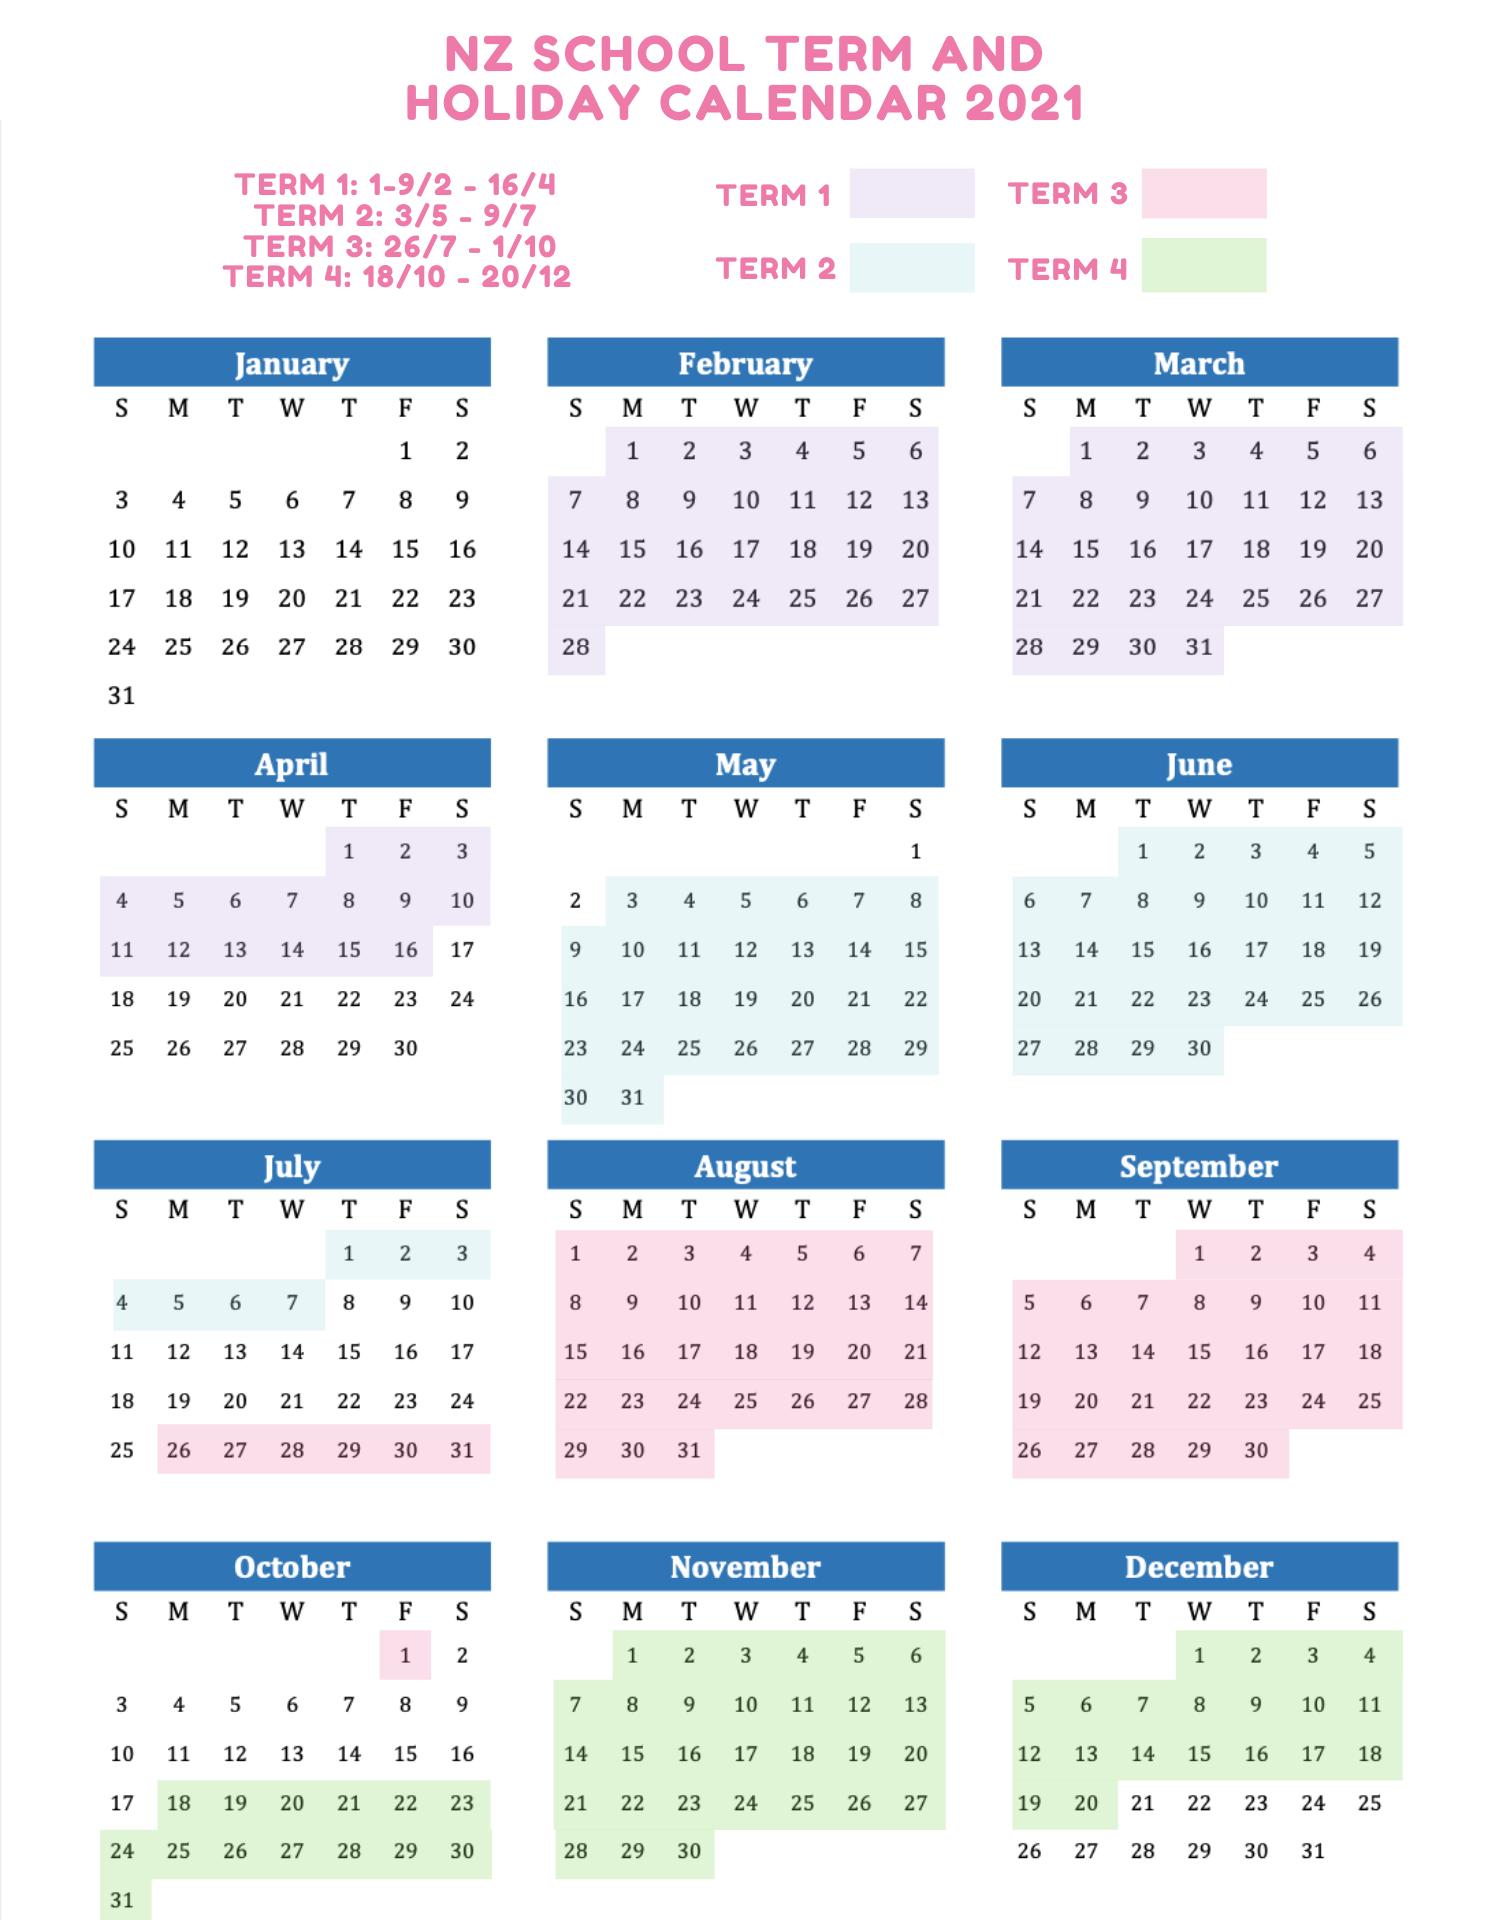 NZ school term and holiday calendar 2021